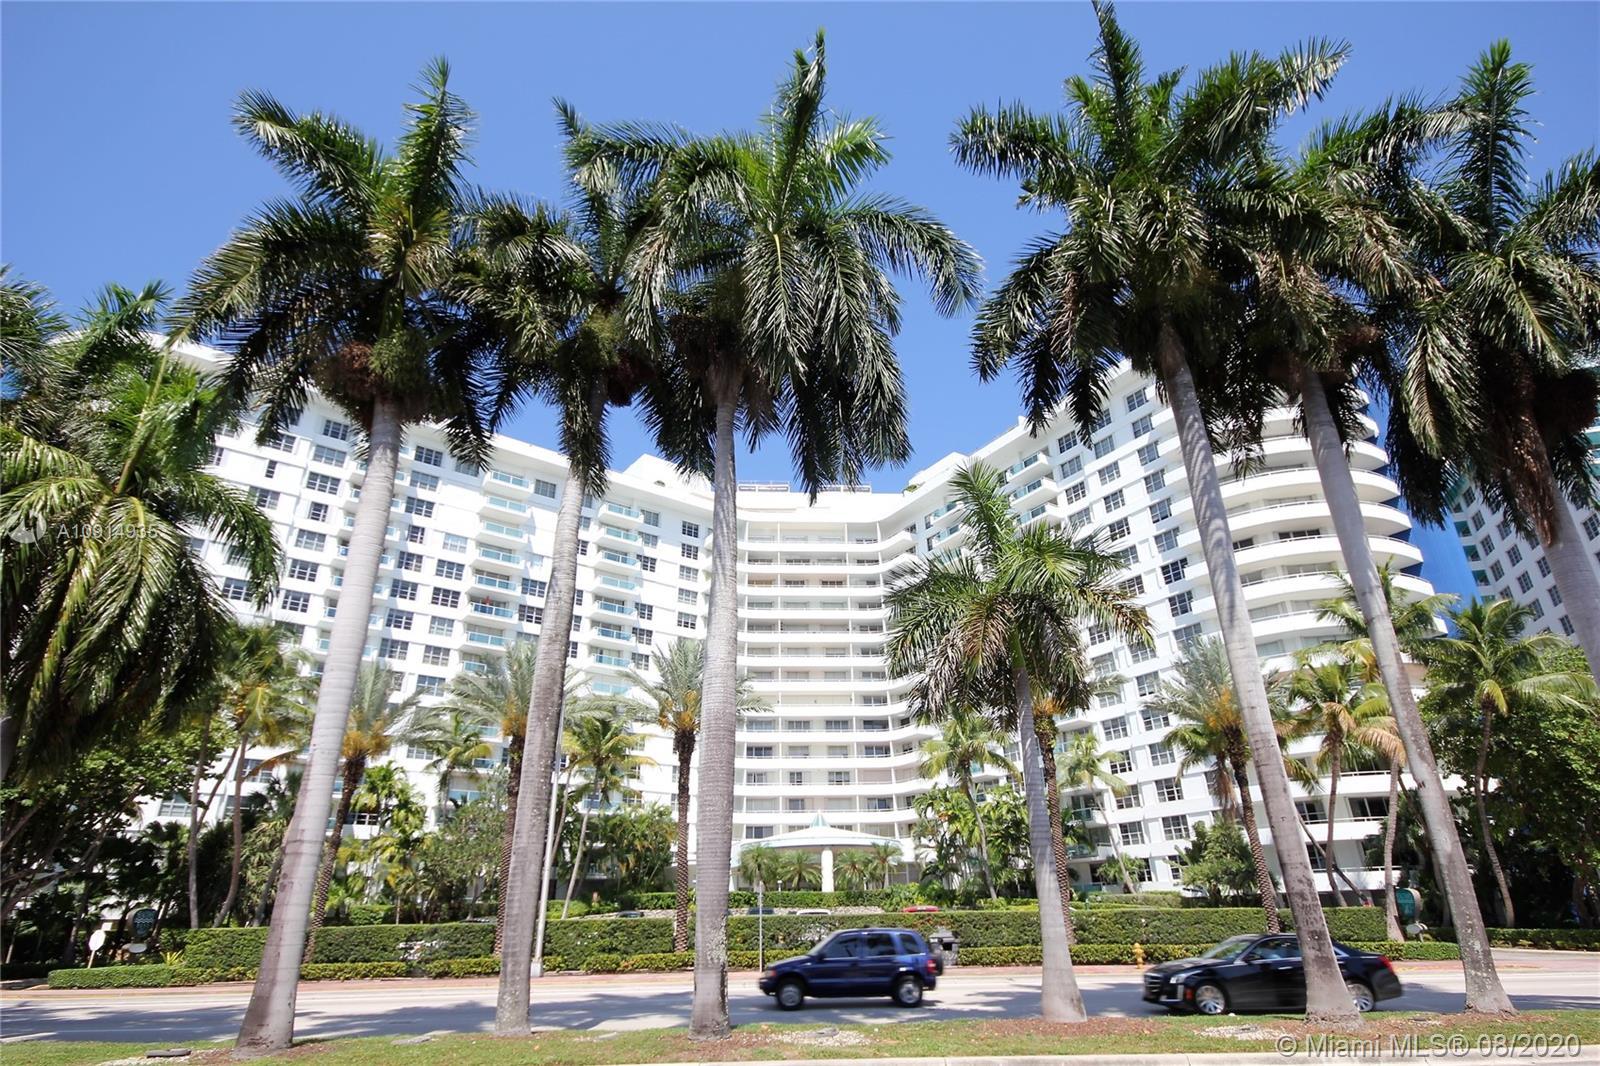 Seacoast 5151 #929 - 5151 COLLINS AV #929, Miami Beach, FL 33140